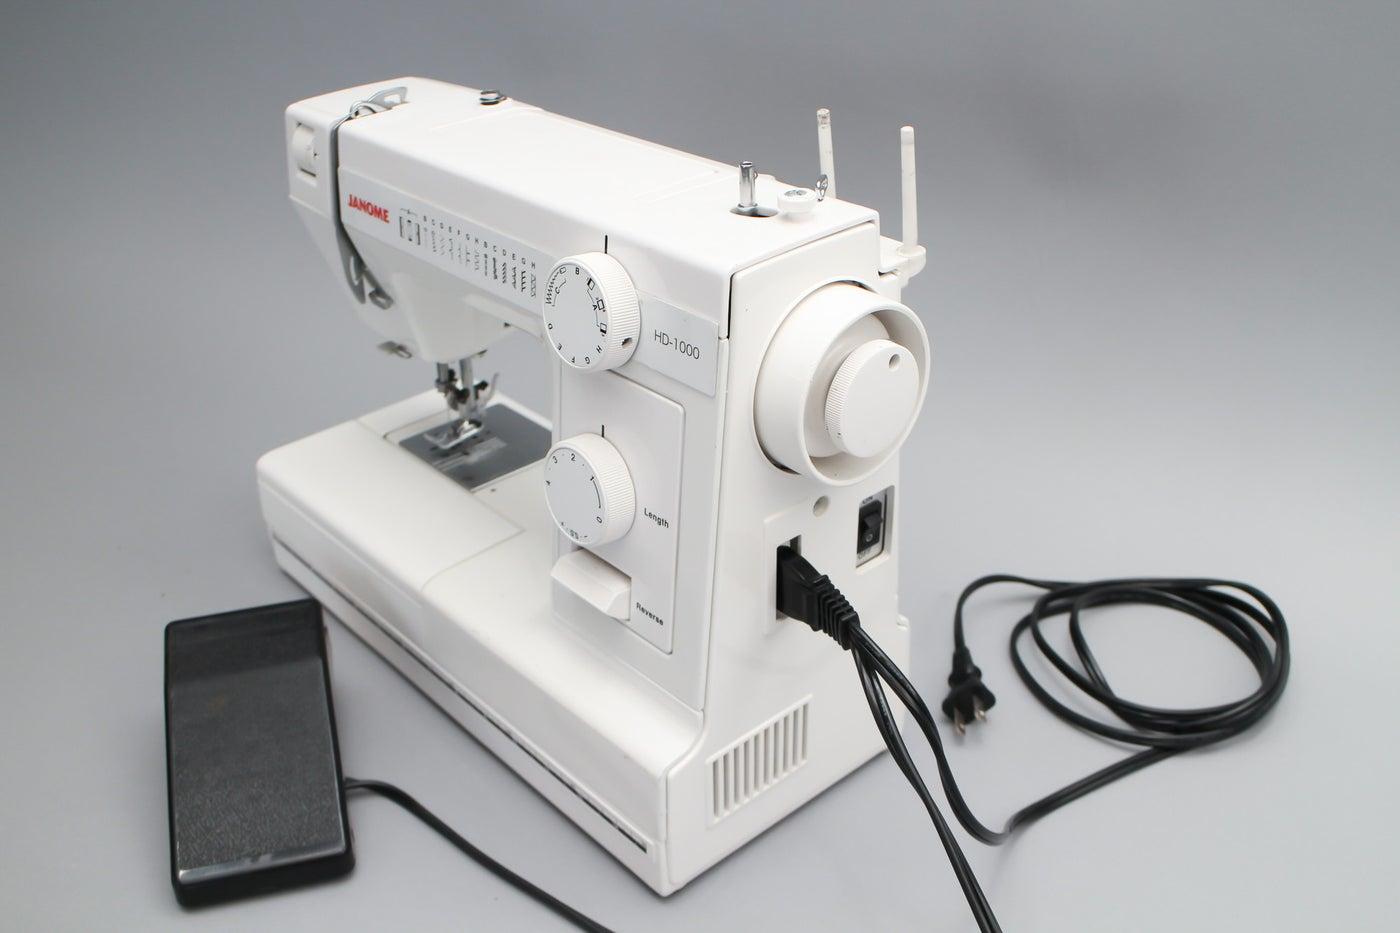 sewing machine-21.jpg